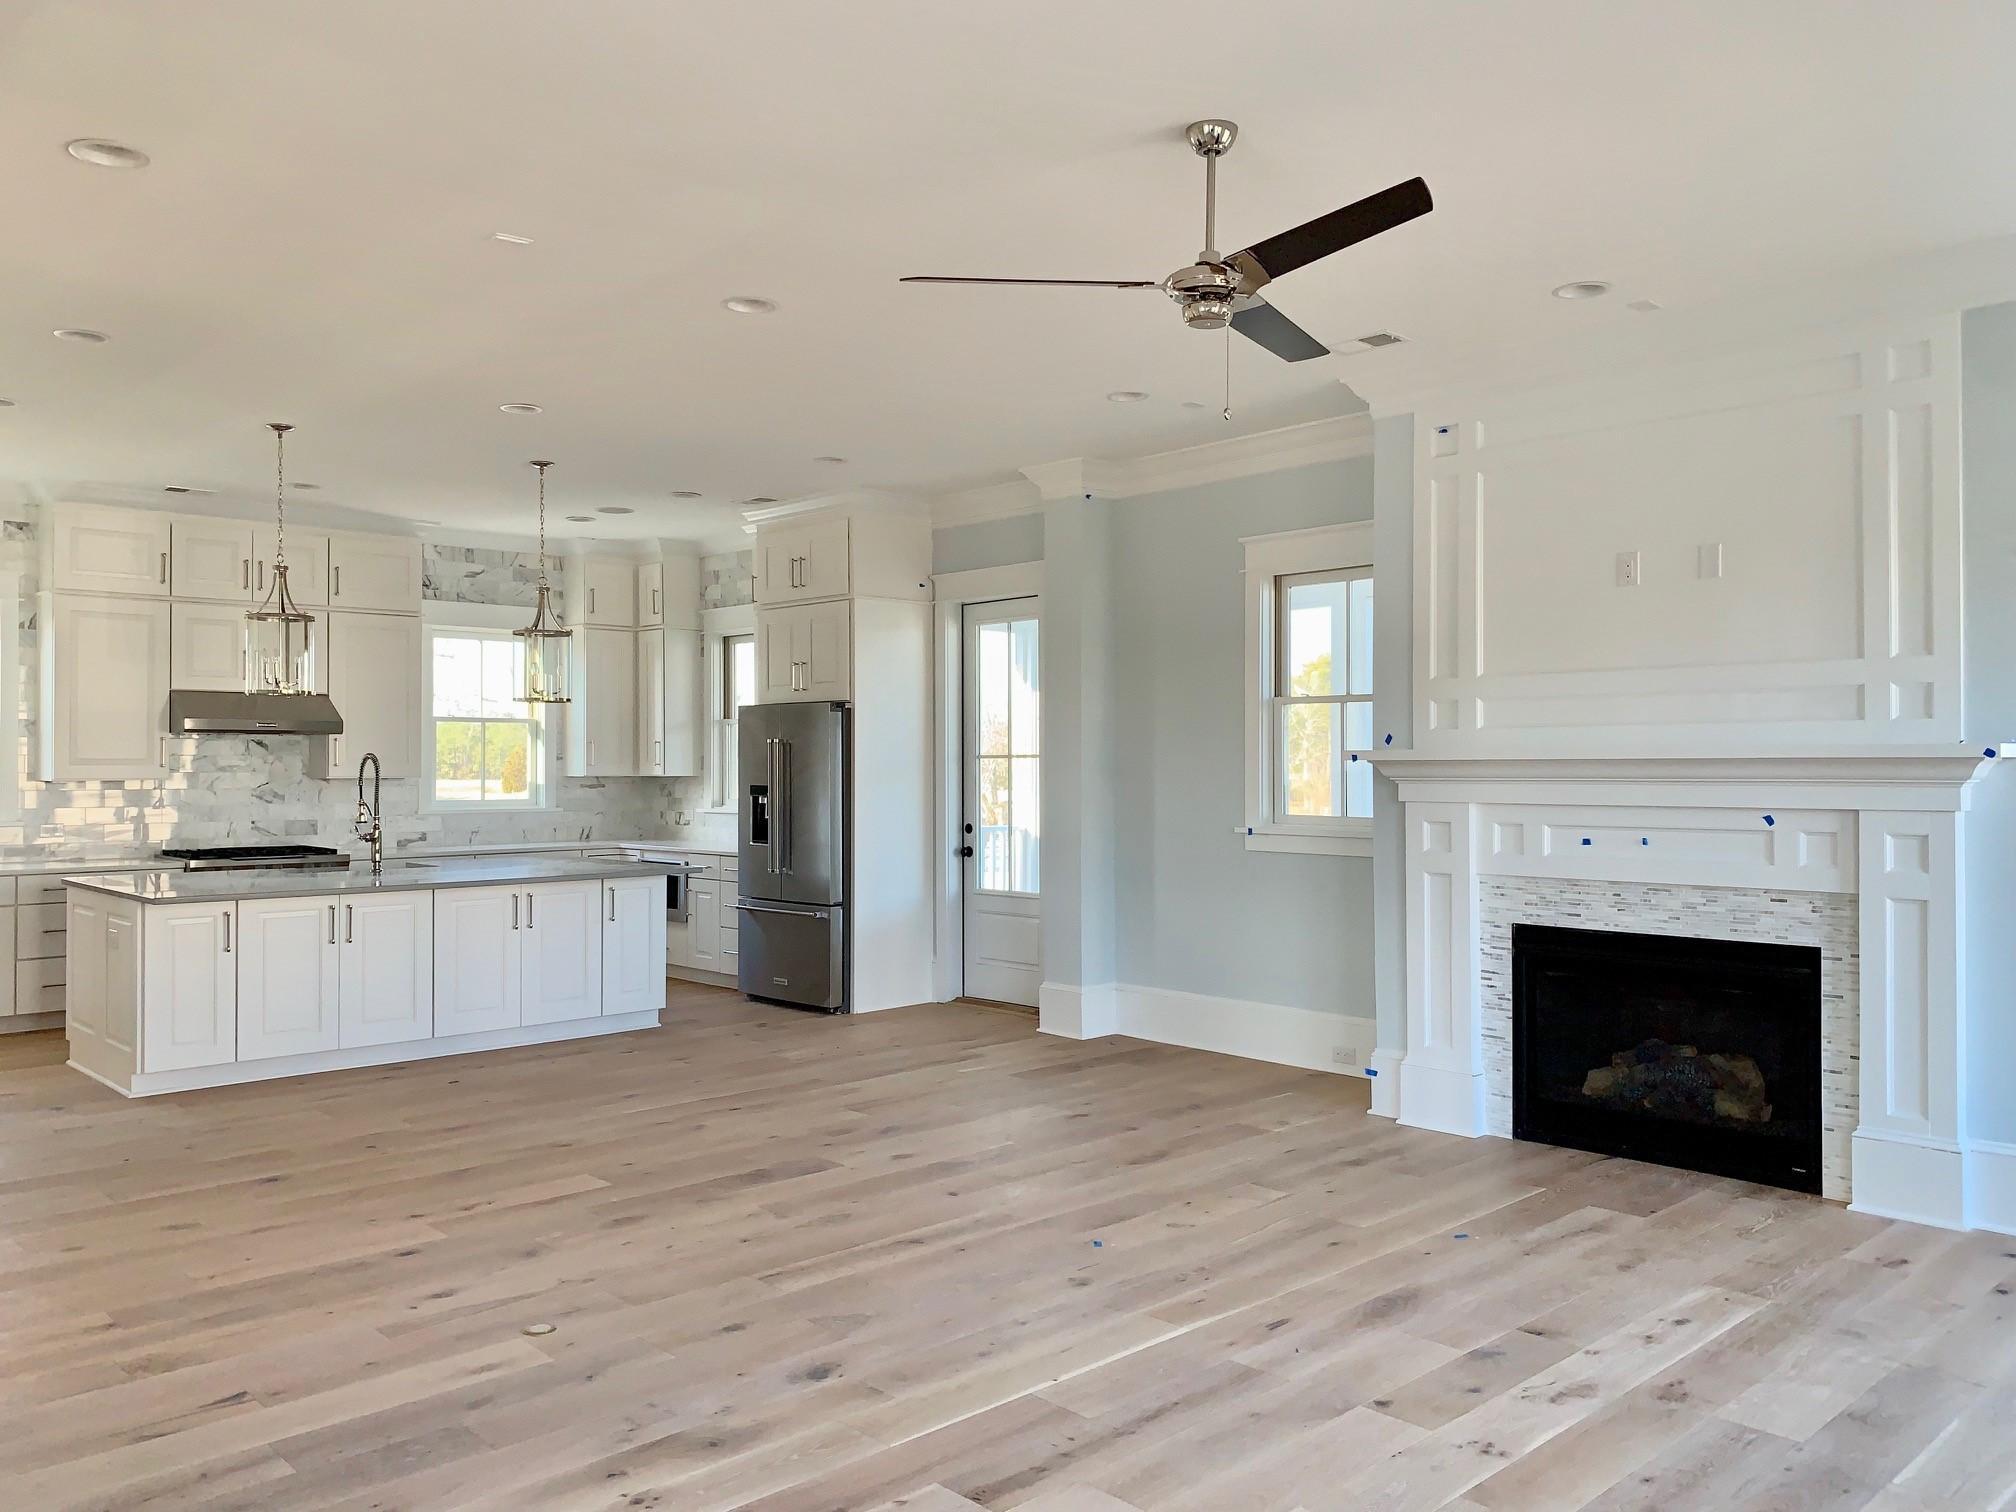 Daniel Island Homes For Sale - 206 Foundry, Charleston, SC - 0